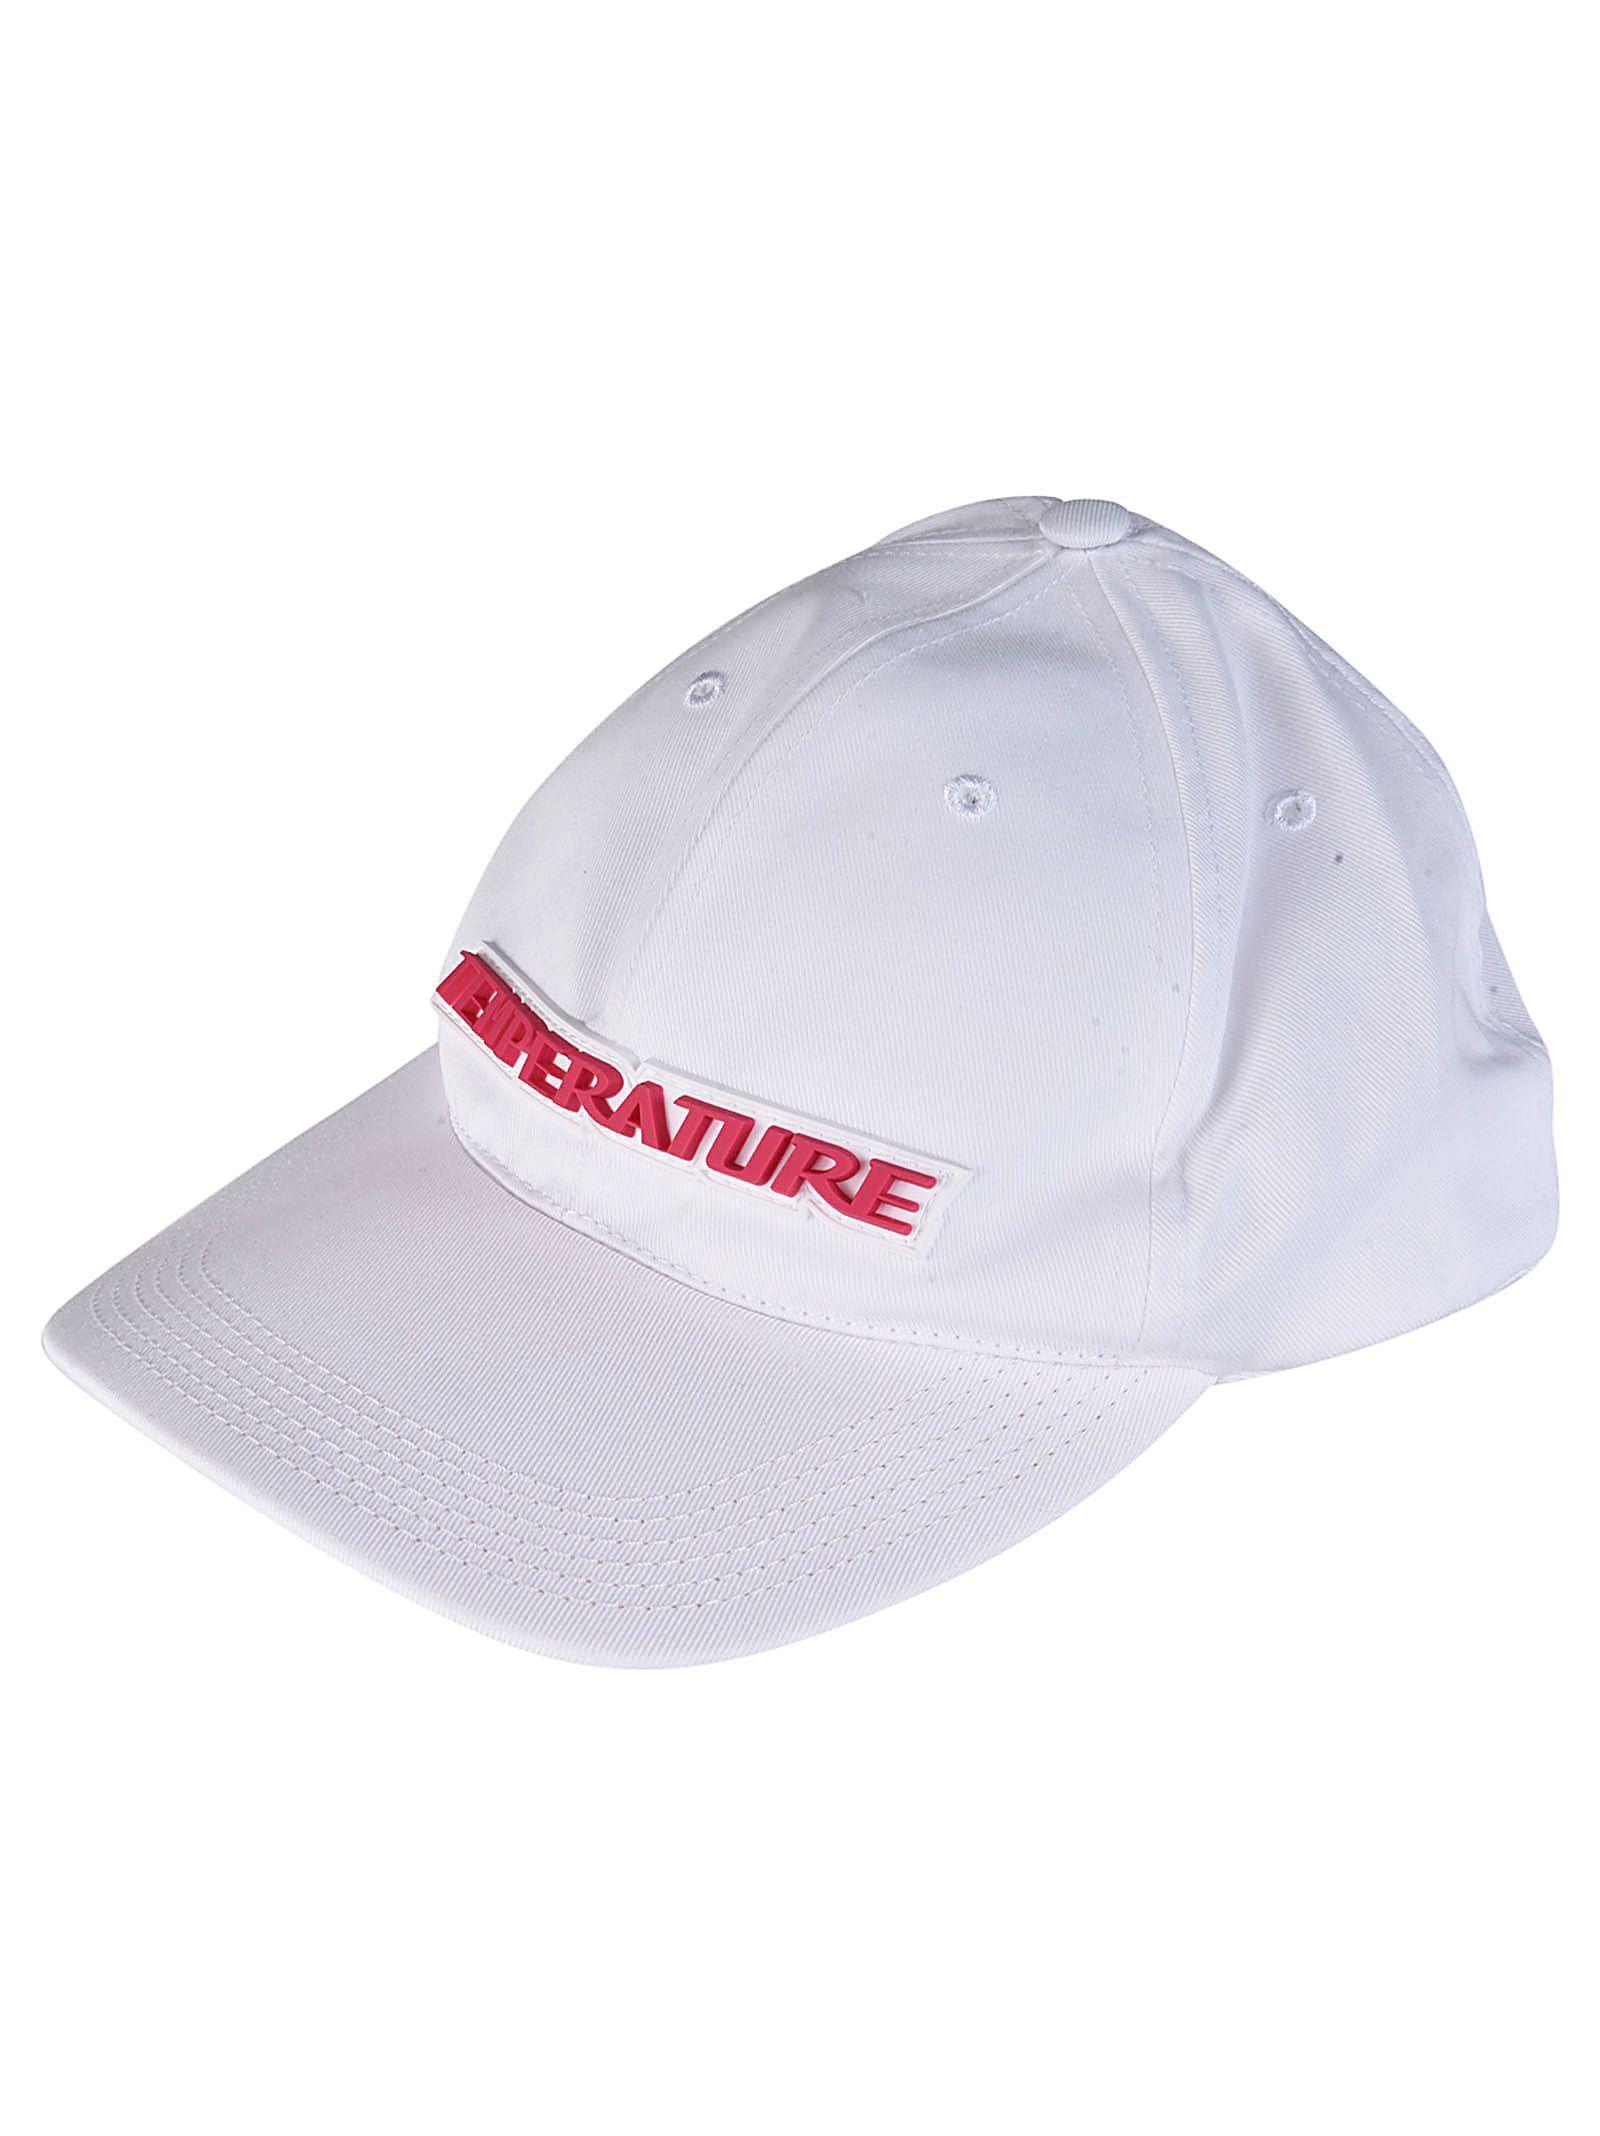 d8852f246058c1 OFF-WHITE OFF-WHITE TEMPERATURE CAP. #off-white #   Off-White Men ...